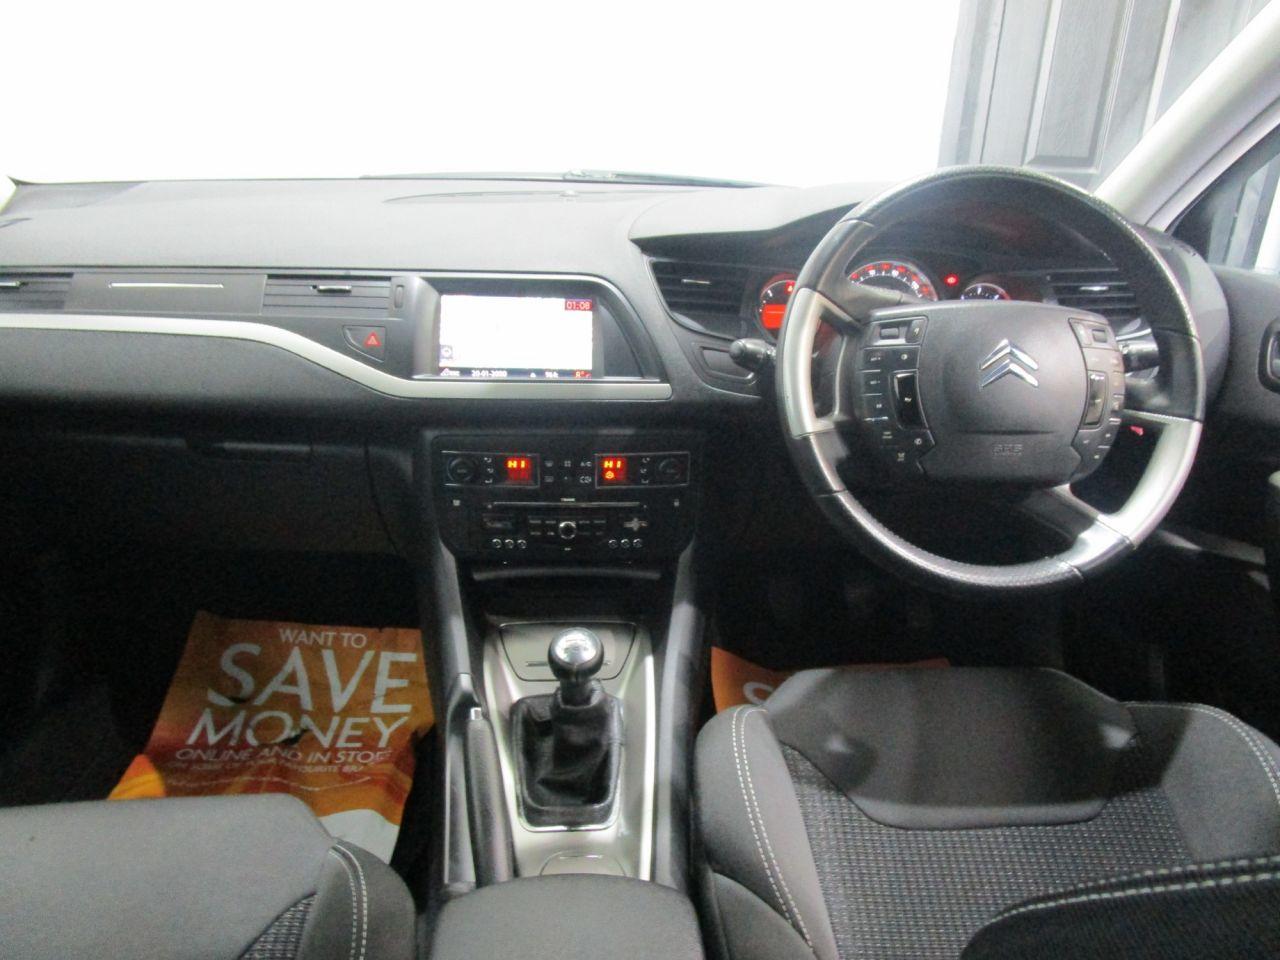 2009 Citroen C5 VTR Plus HDI Nav £3,490